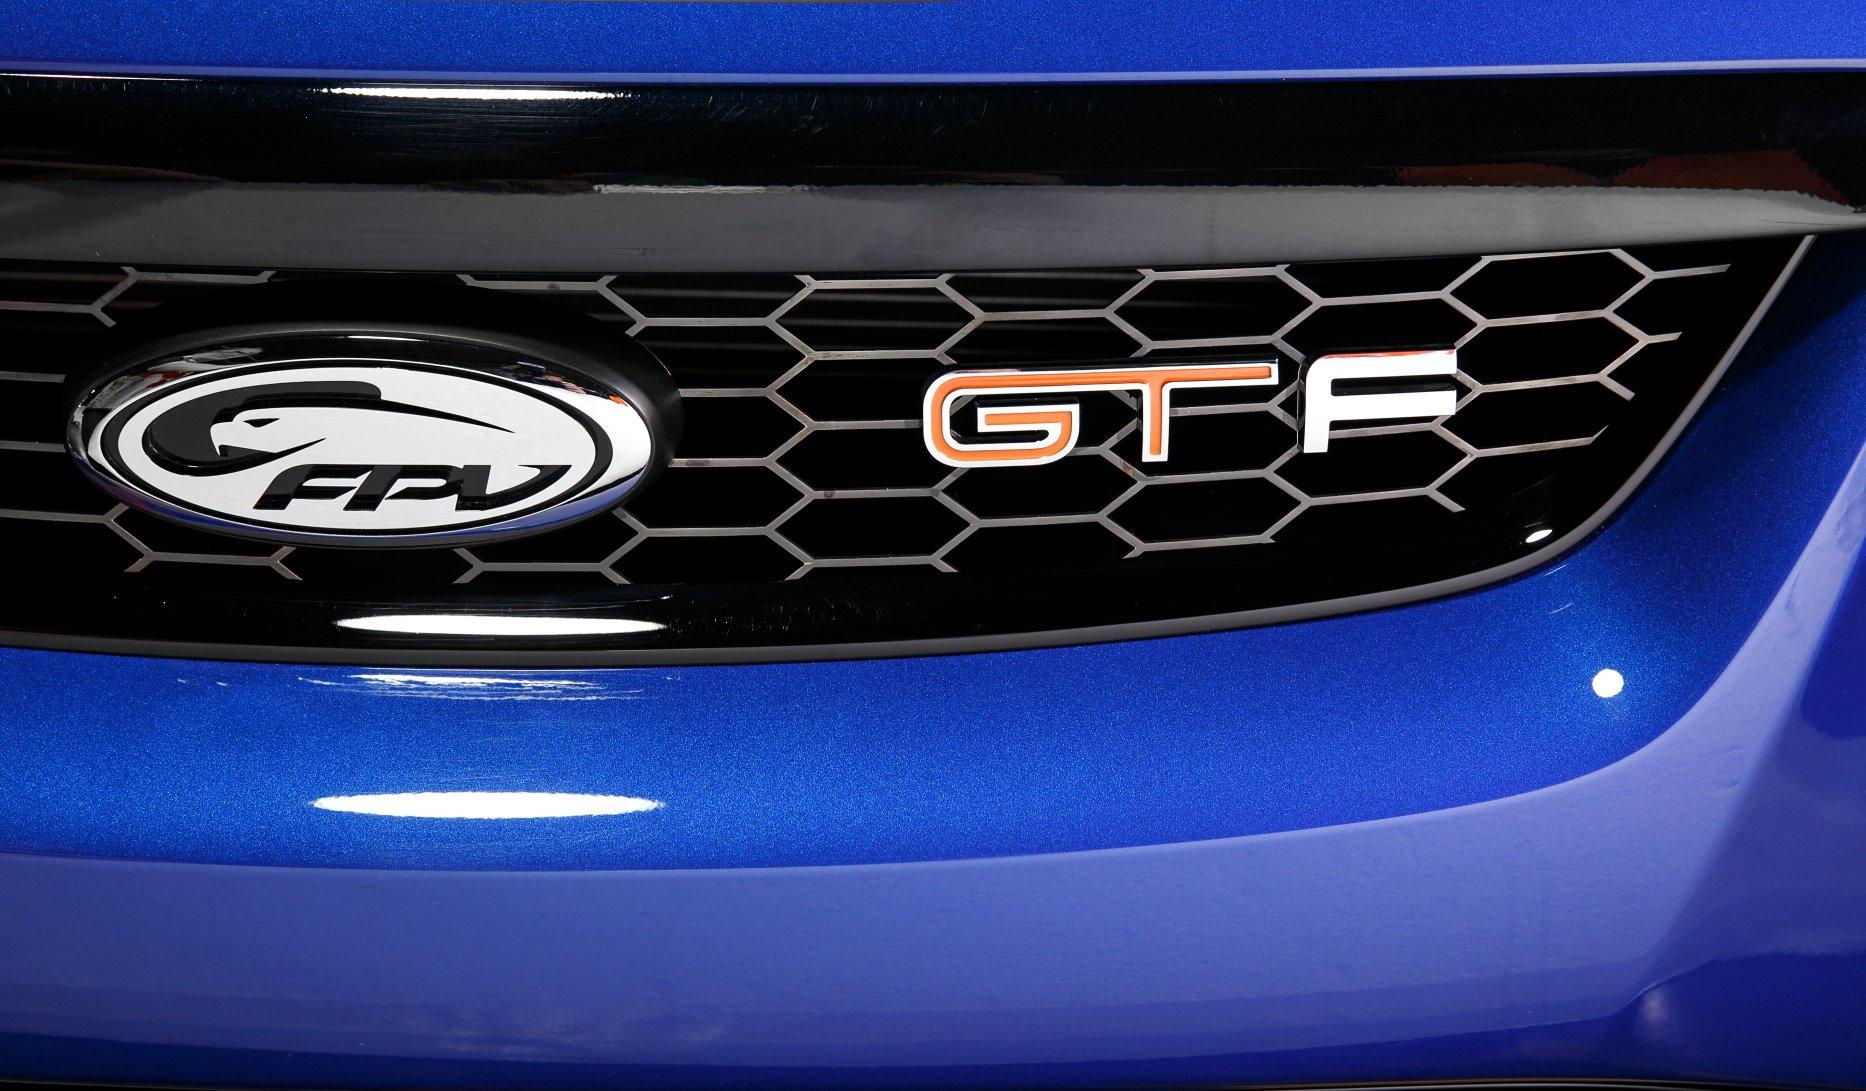 FPV GT F previewed through Facebook, debuts June 10